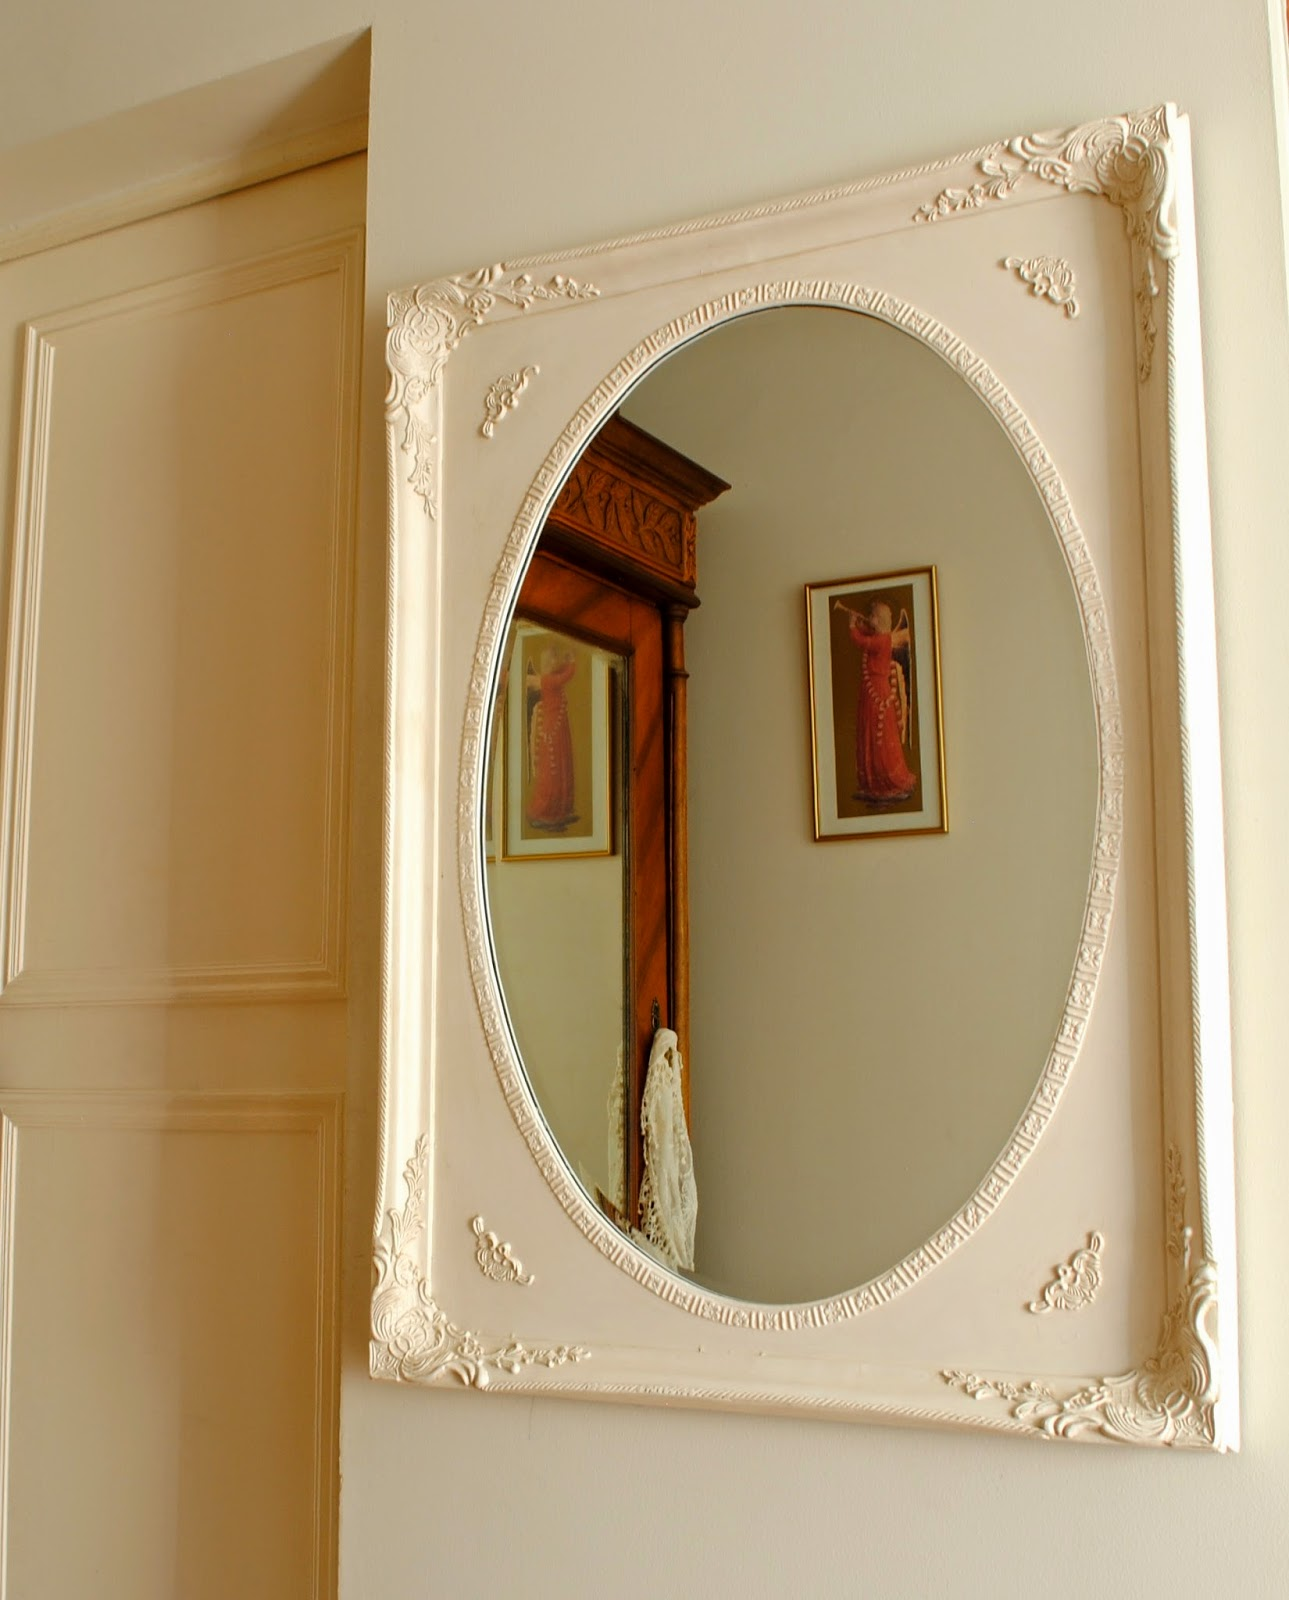 Paz montealegre decoraci n espejos estilo barroco for Espejo ovalado blanco